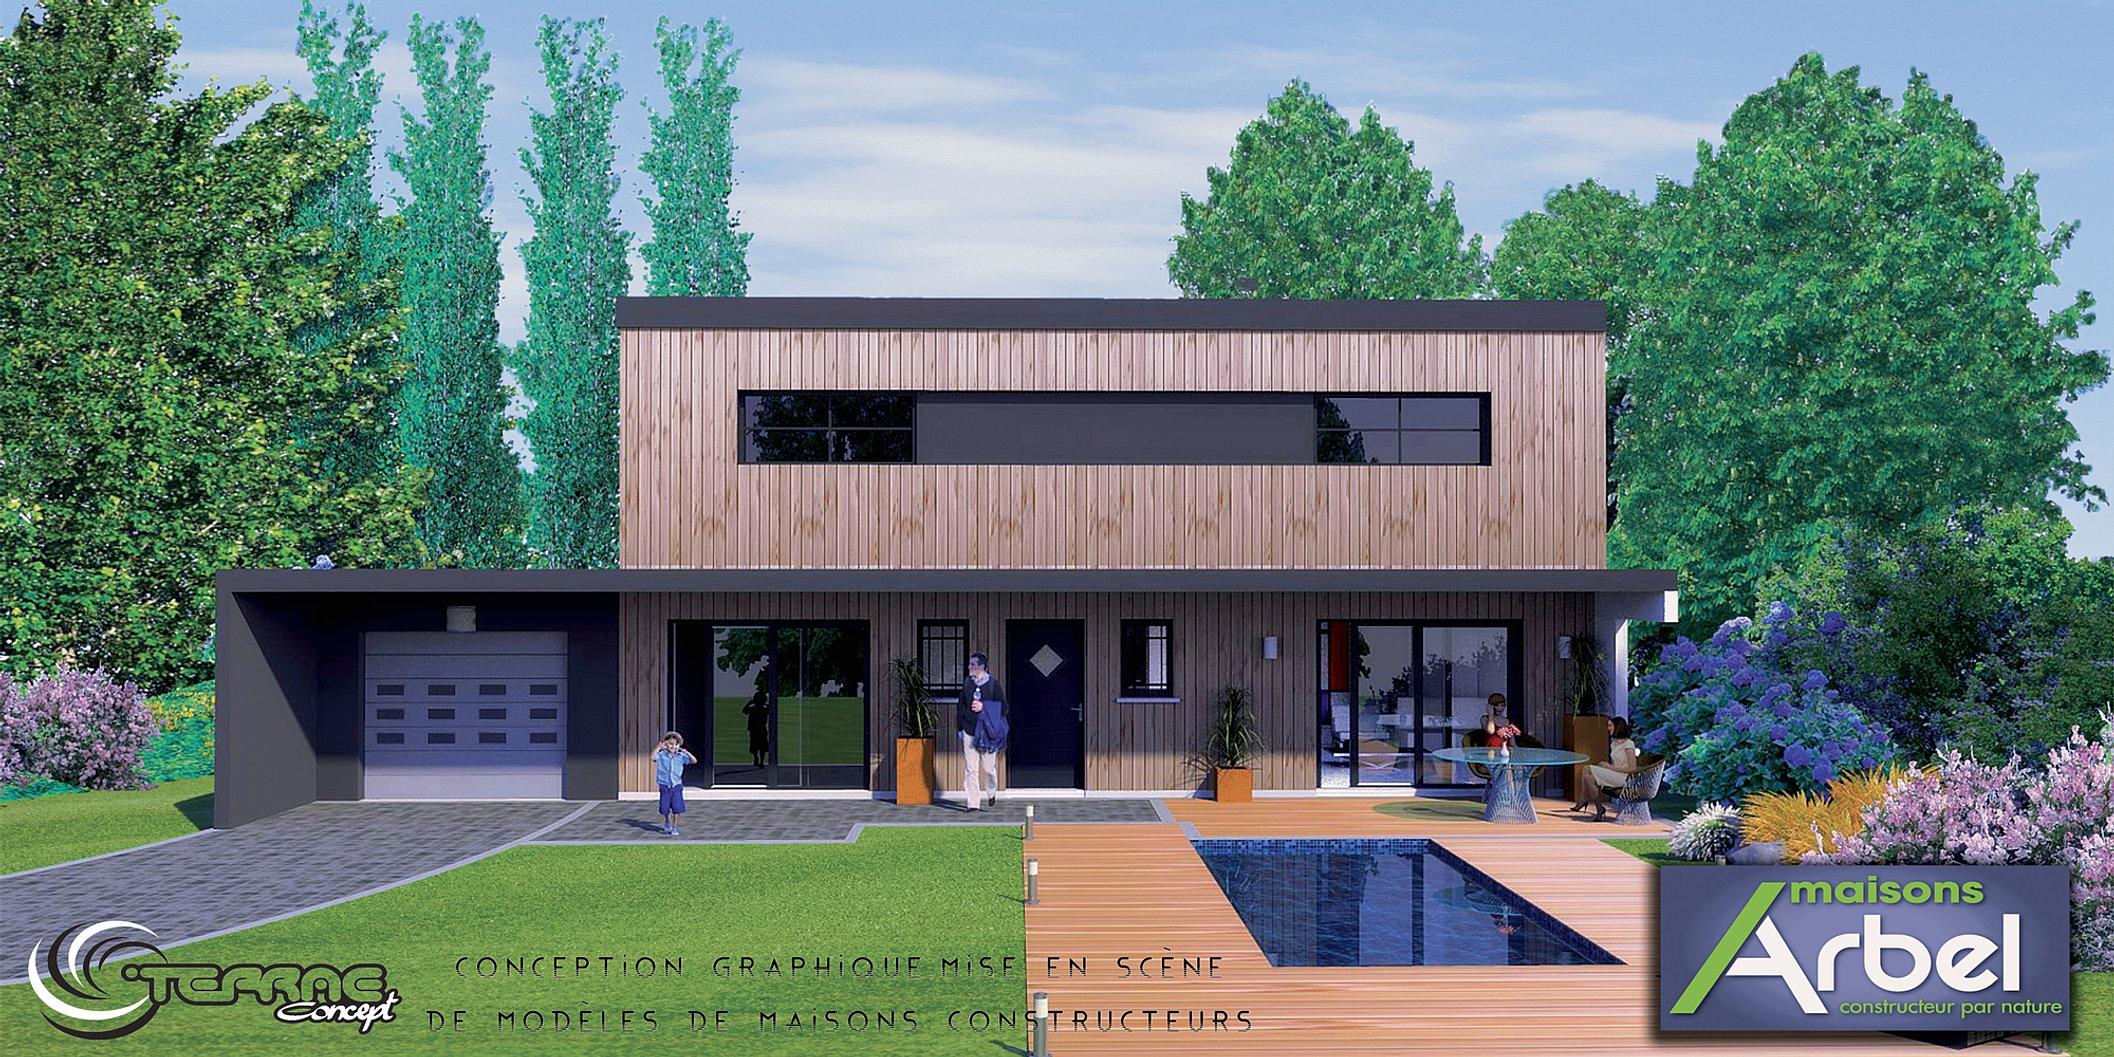 Finest toit terrasse image de maison d bardage bois with modele maison toiture terrasse